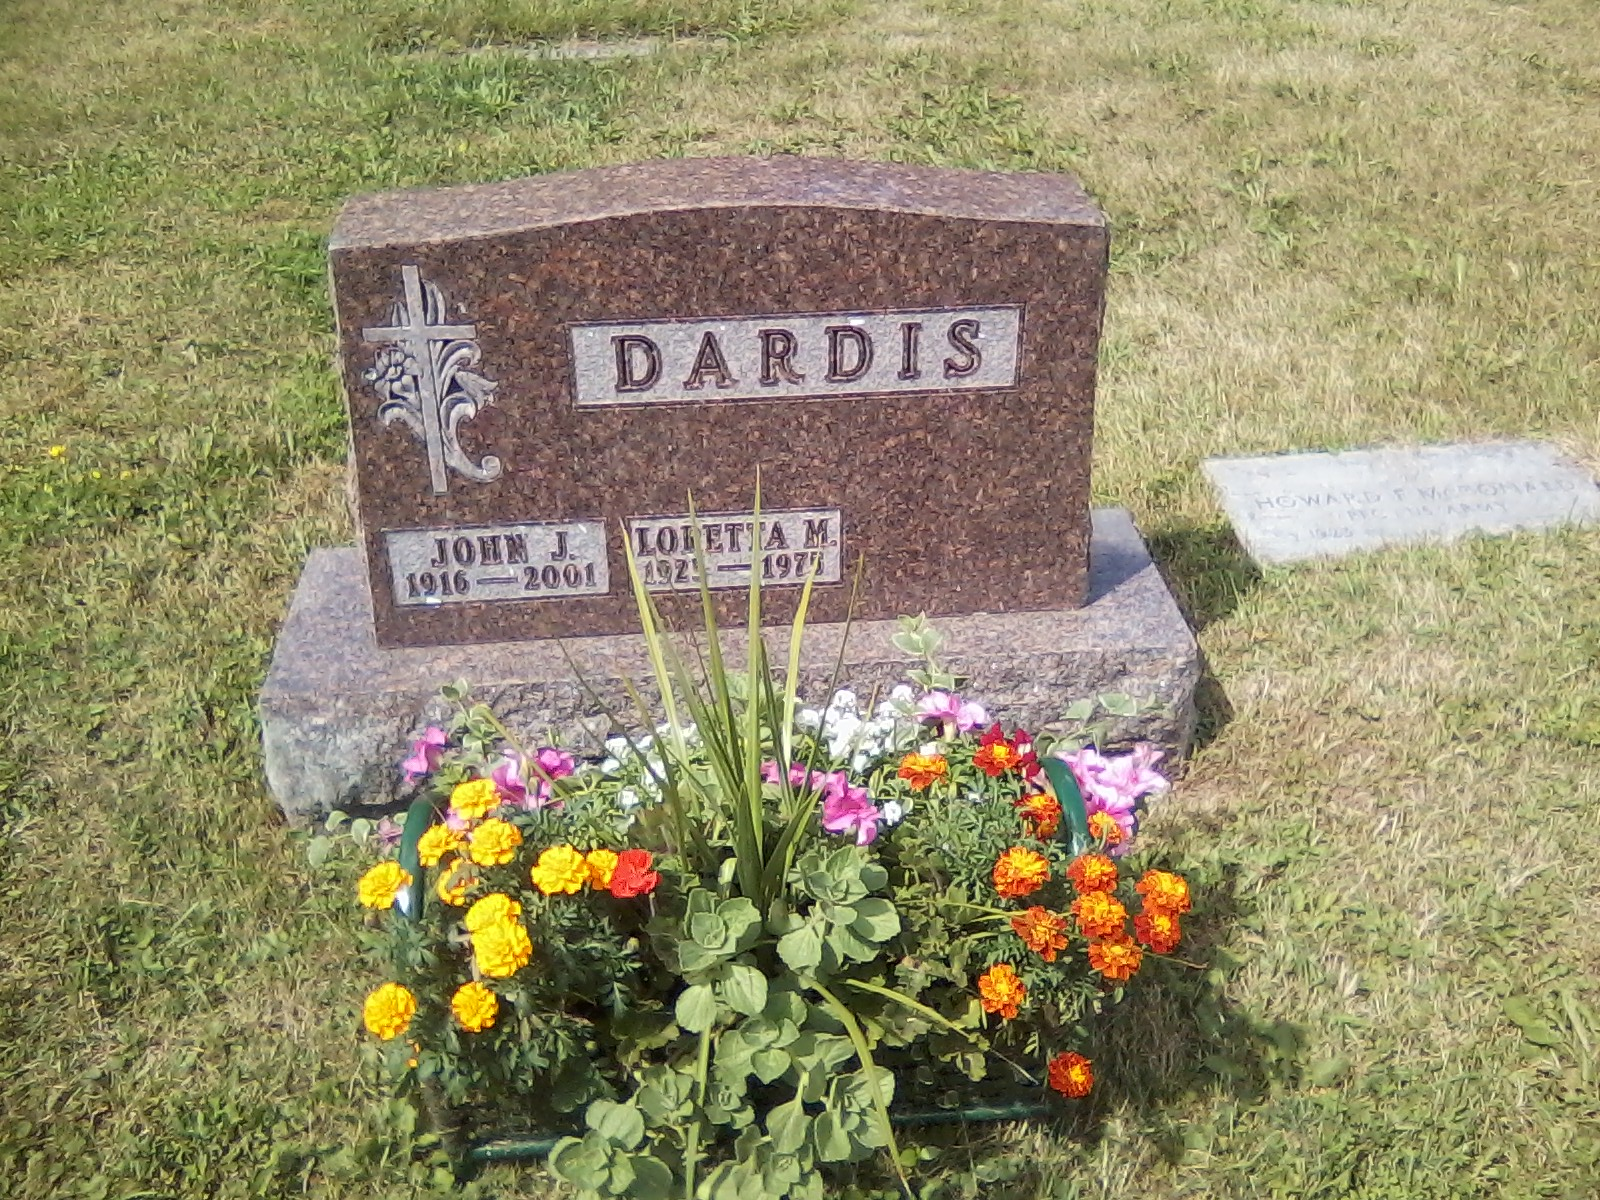 John James Dardis